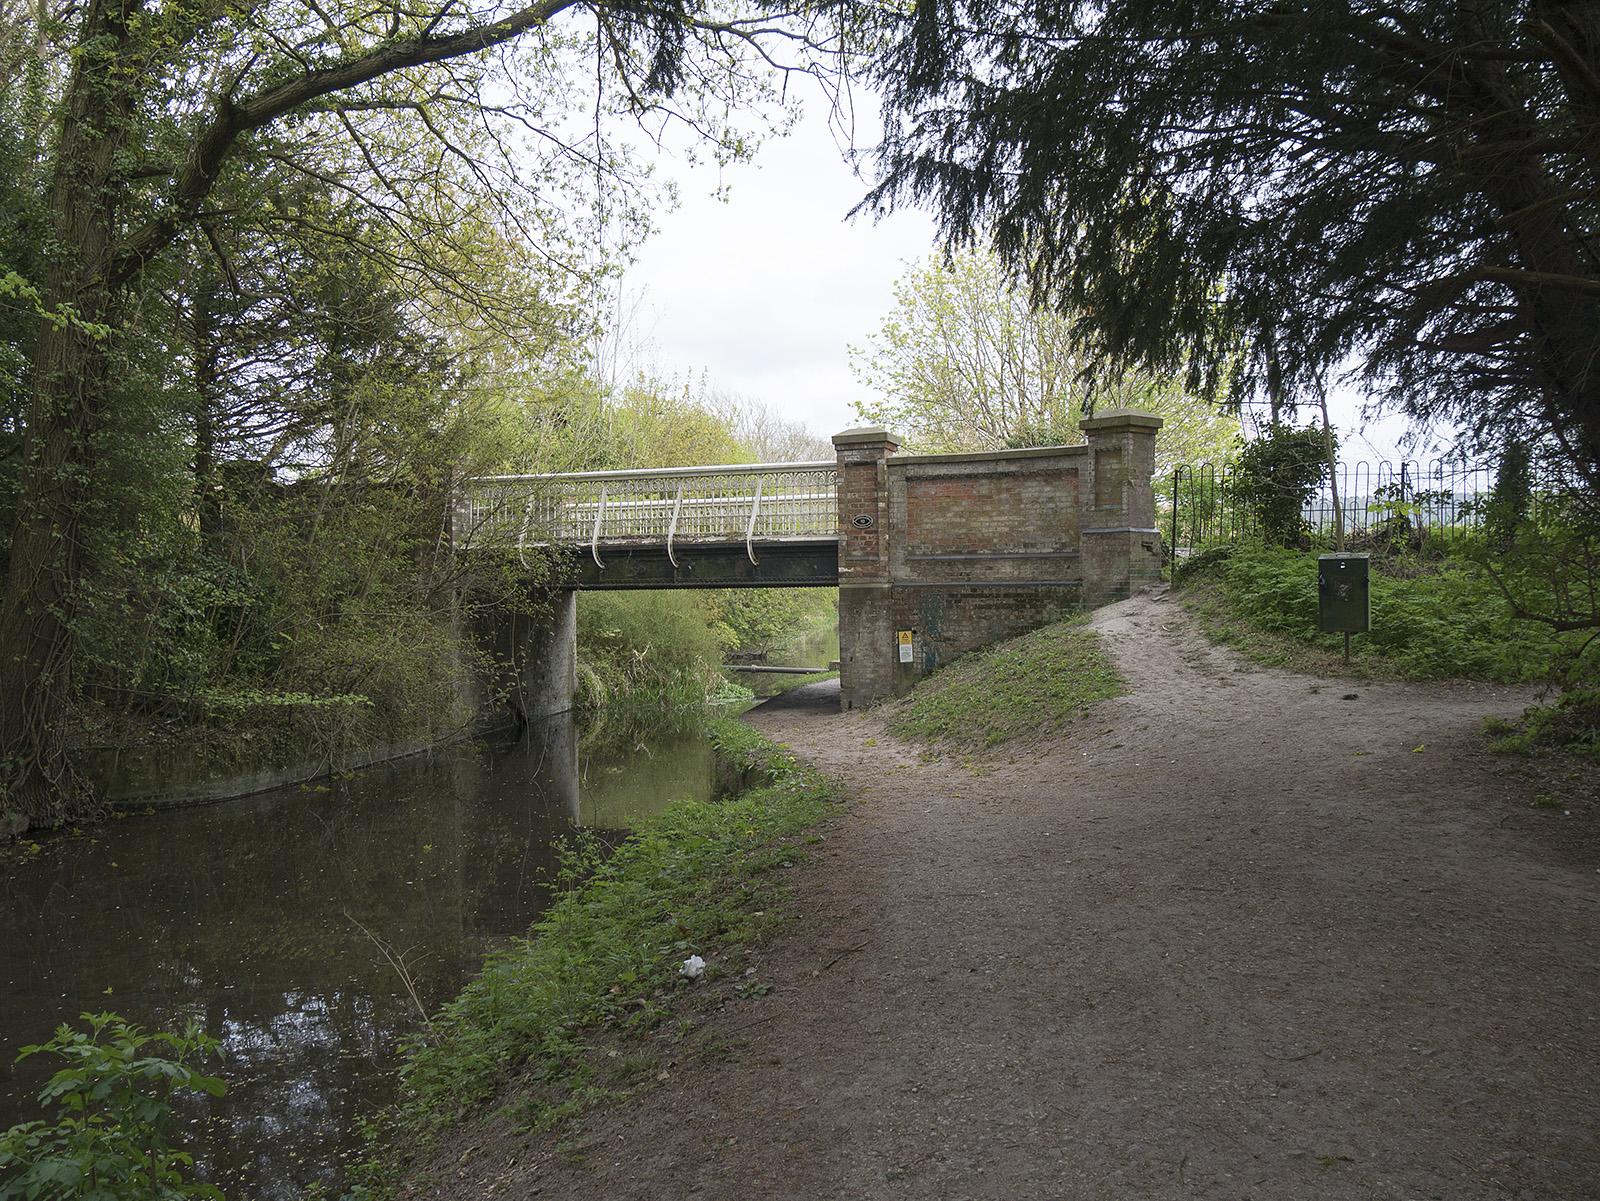 Perch bridge